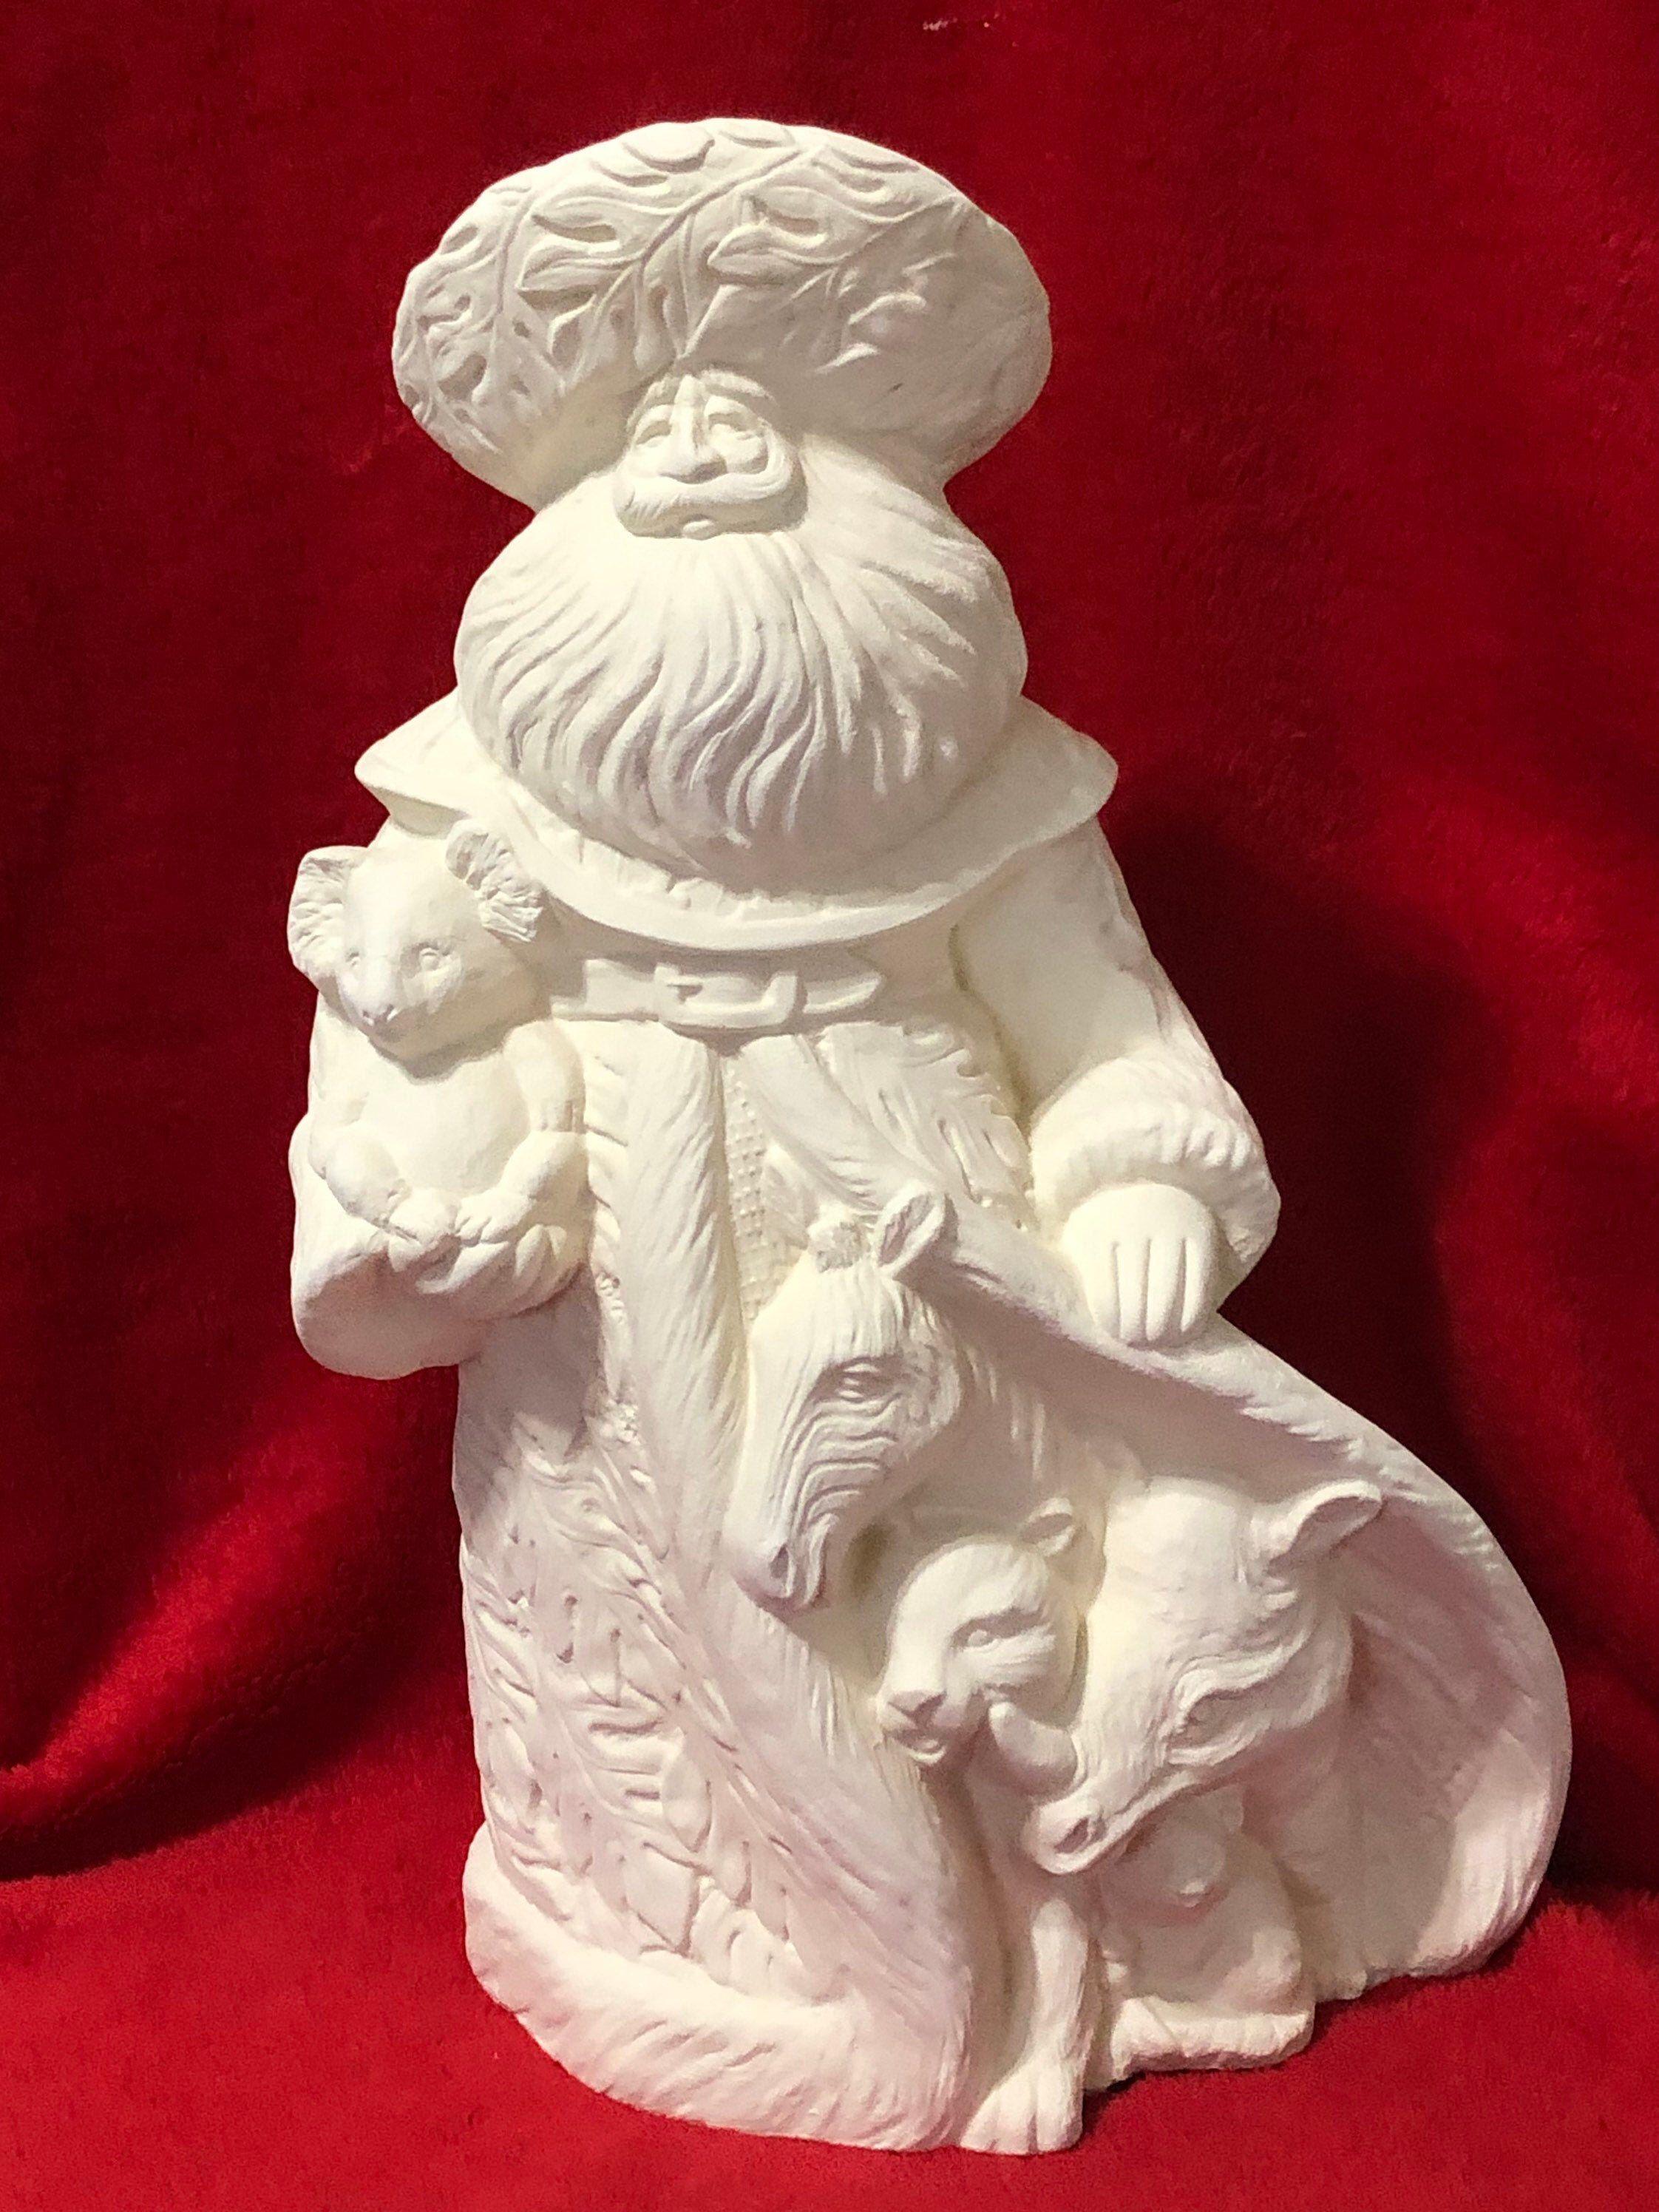 Rare 14 Inch Gare Rain Forest Santa Clause In Ceramic Bisque Ready To Paint In 2020 Ceramic Bisque Handmade Ceramics Painting